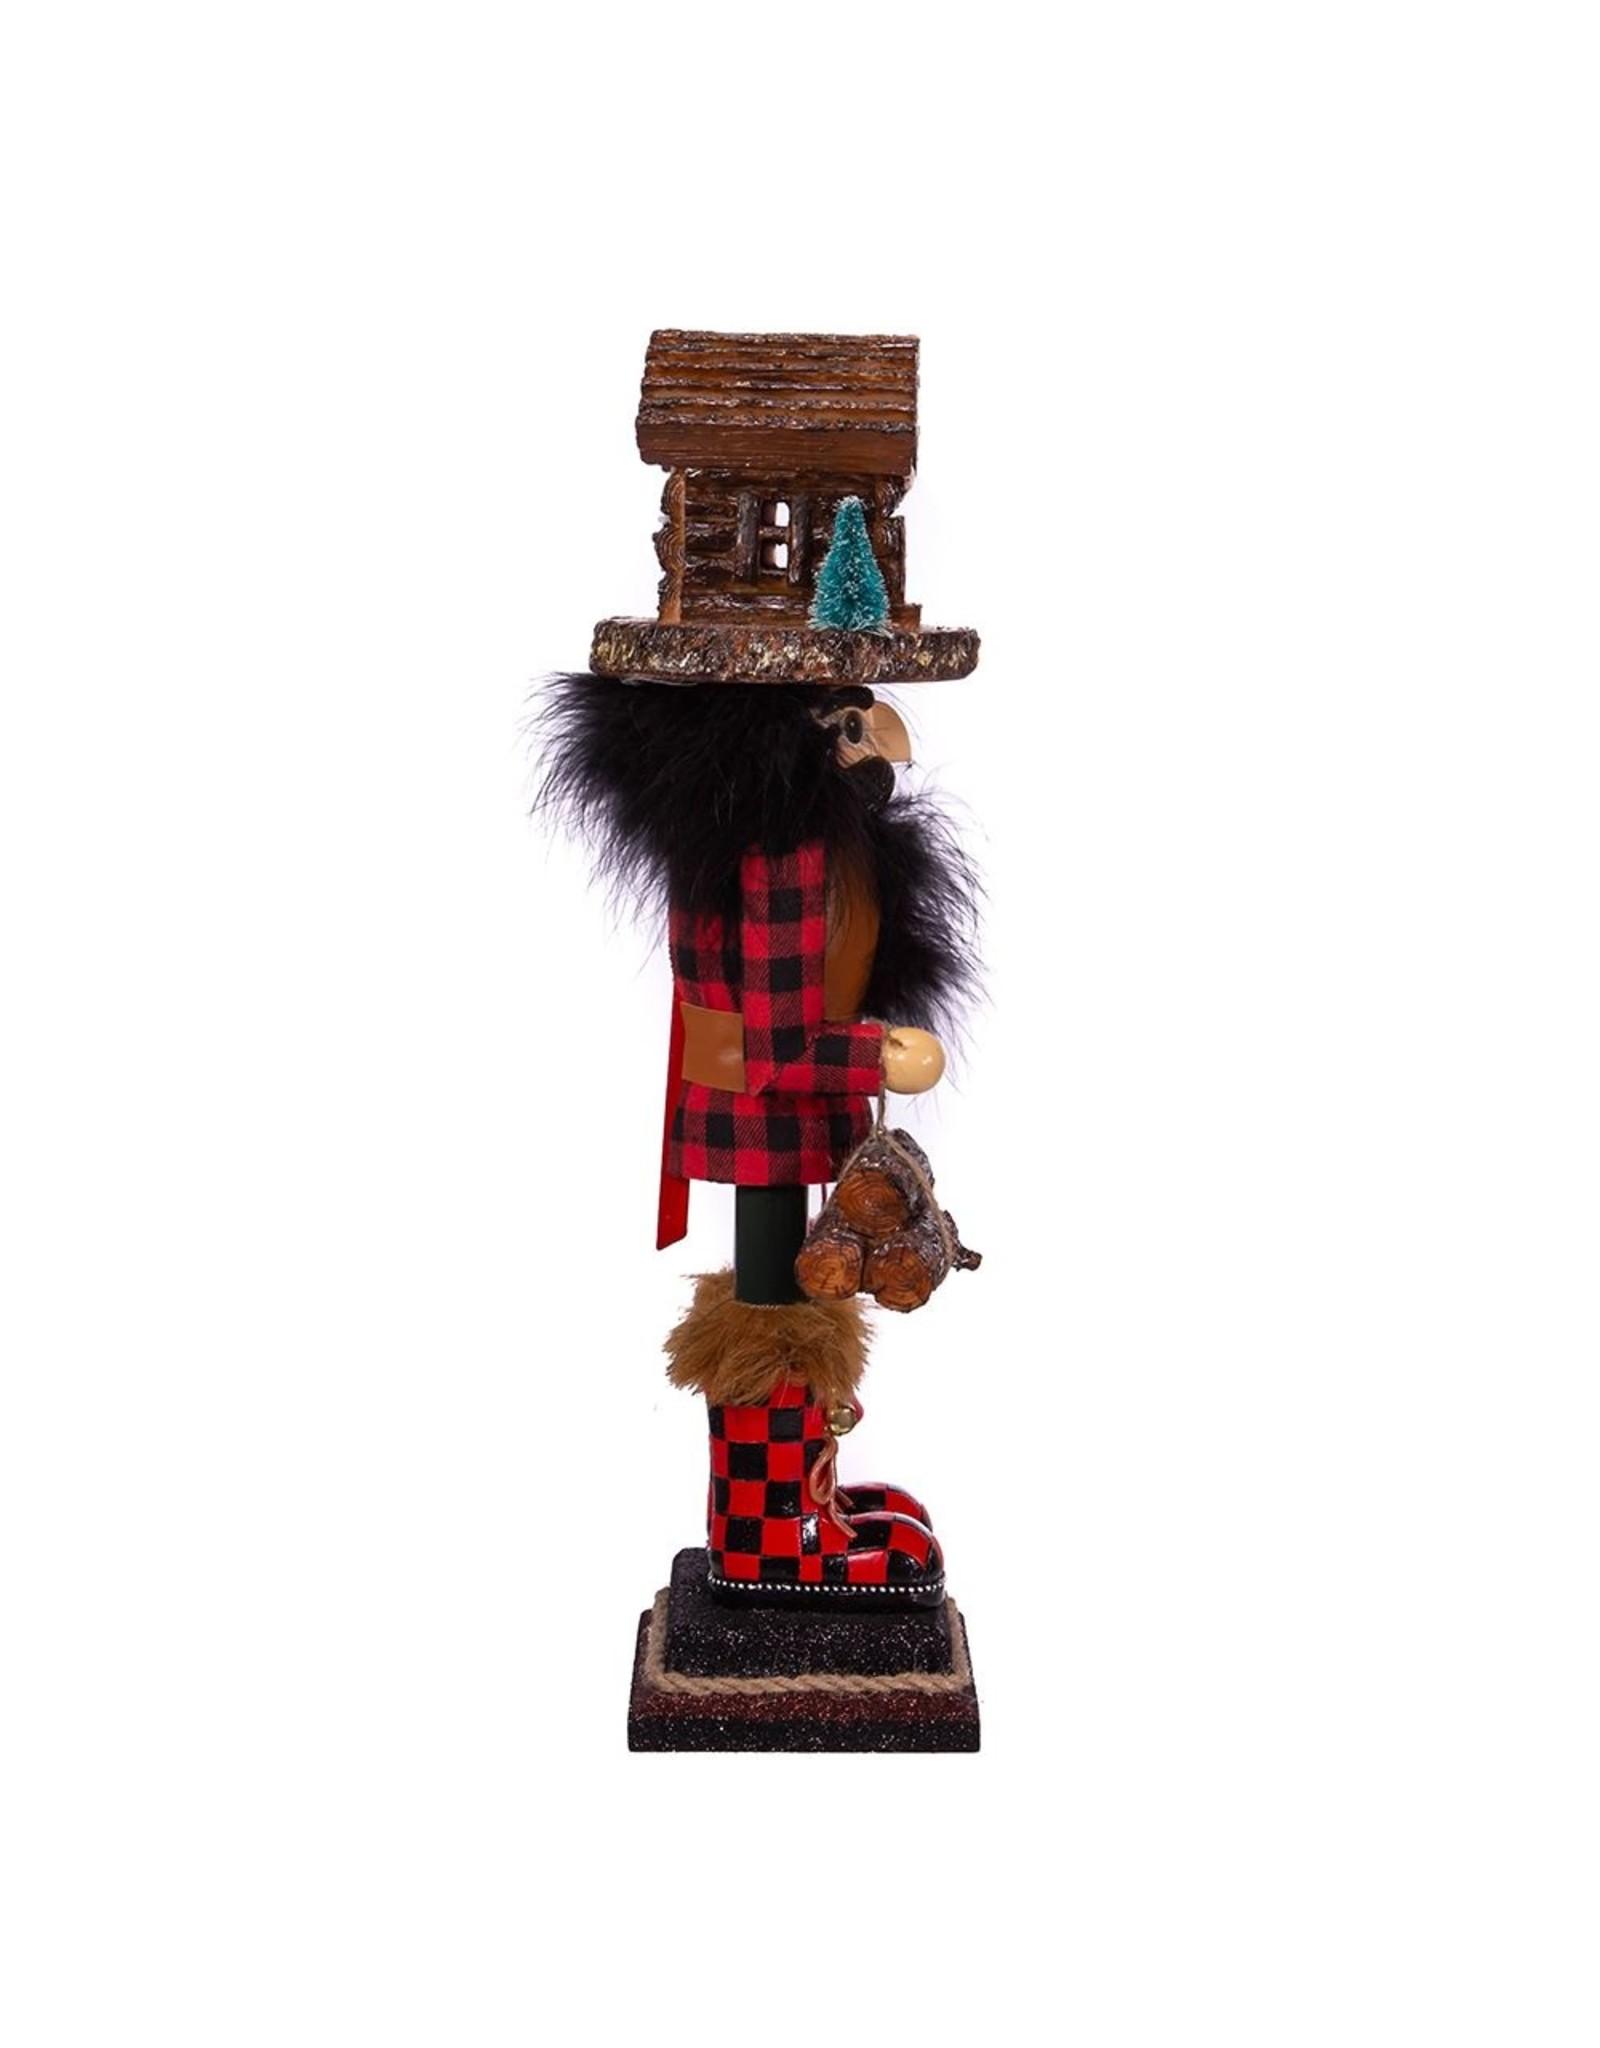 Kurt S. Adler Lodge Nutcracker w/ Cabin Hat